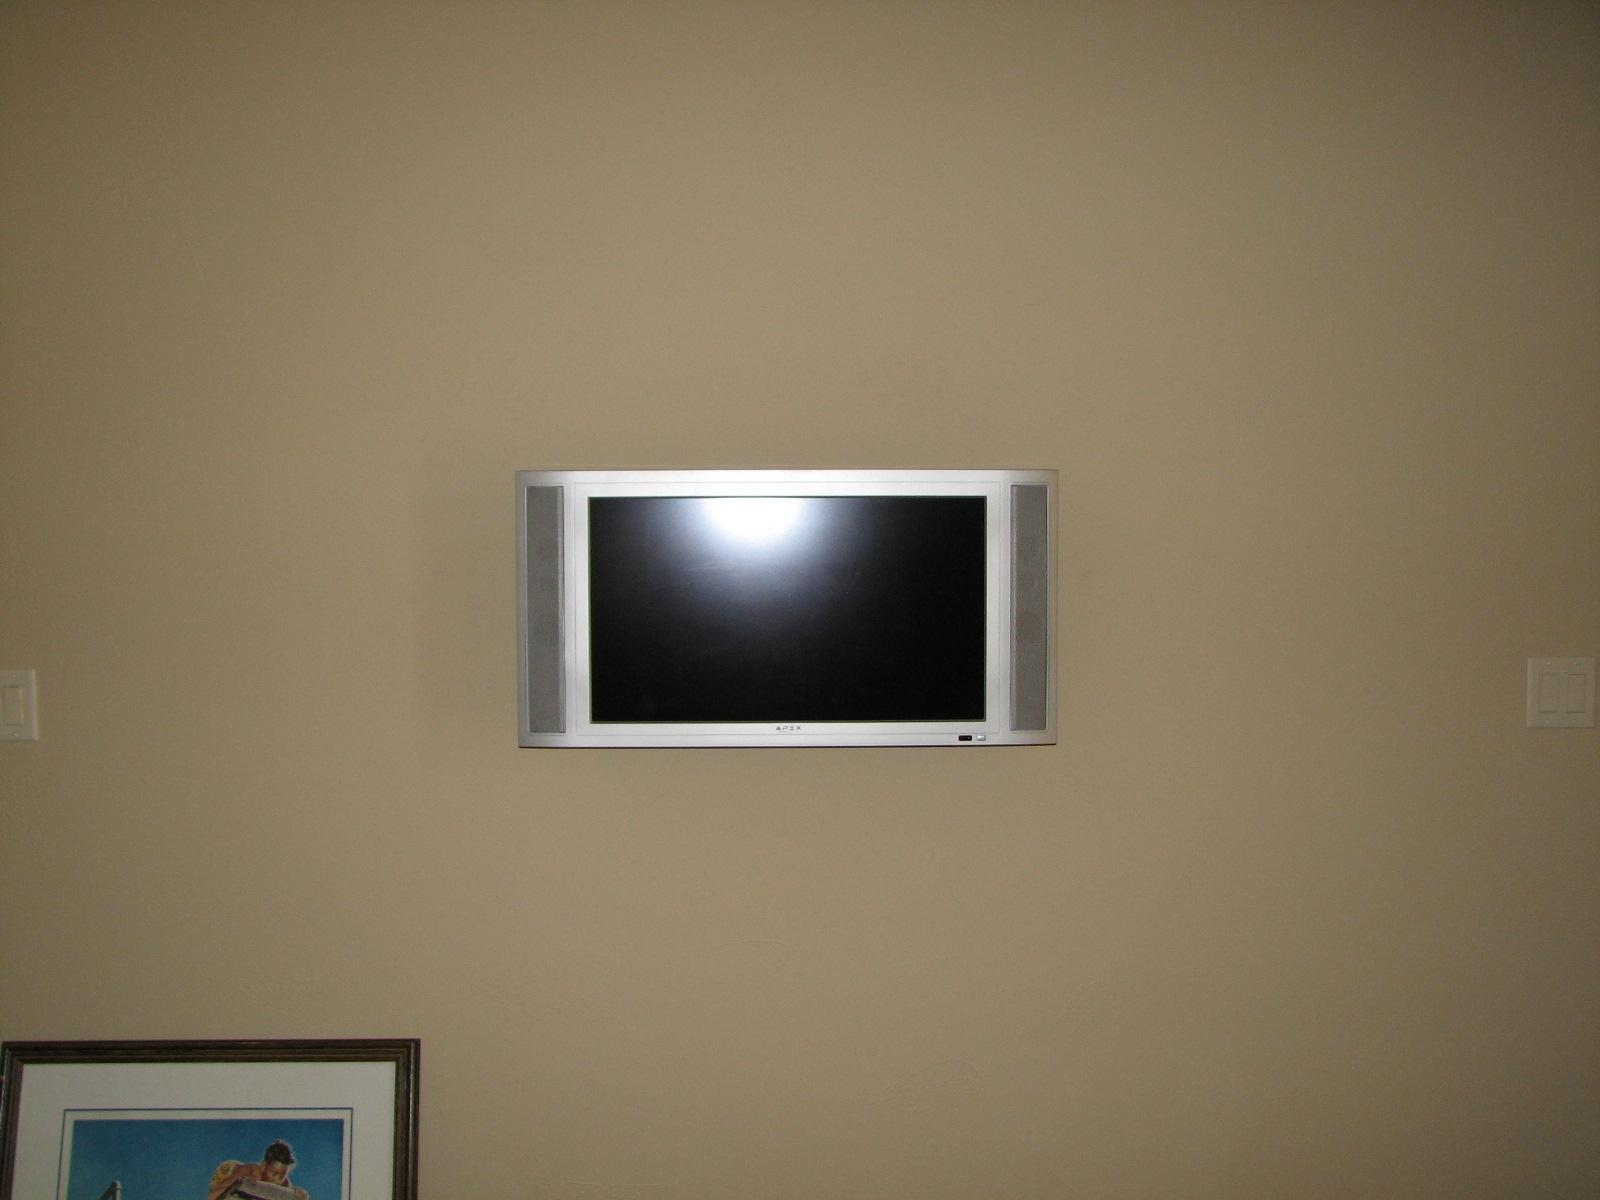 tv installations unisen media llc. Black Bedroom Furniture Sets. Home Design Ideas